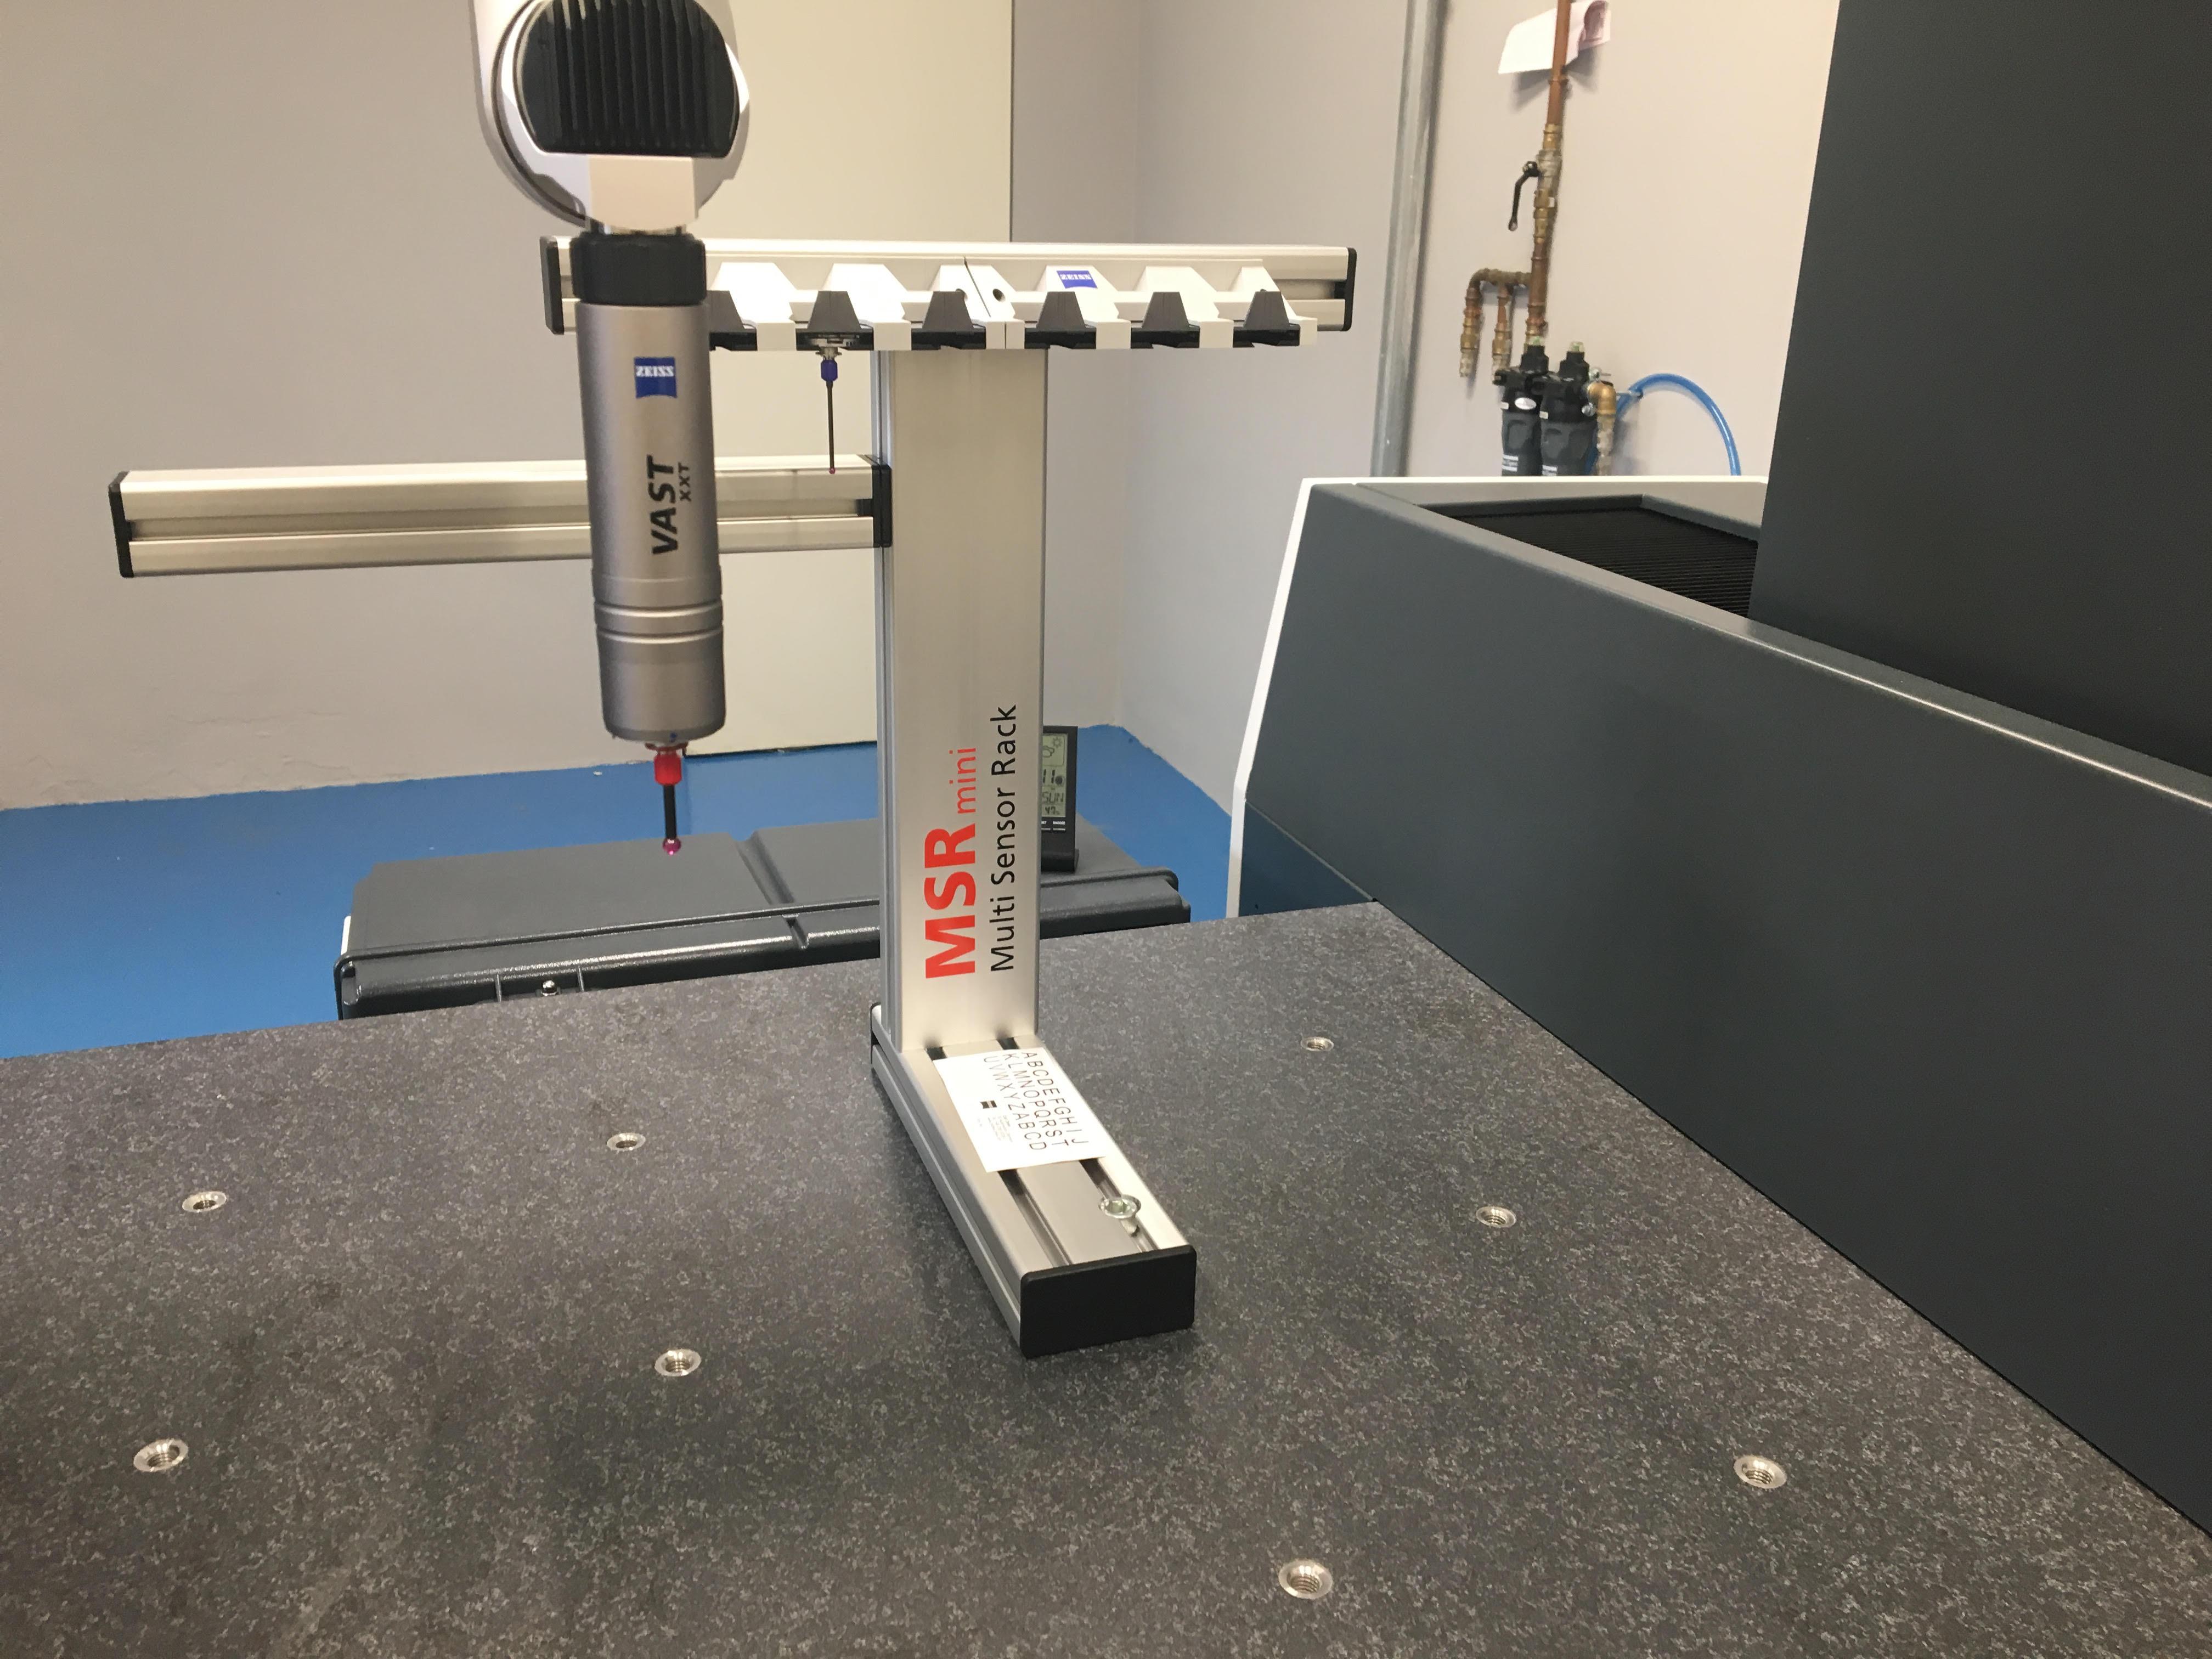 sala metrologica controllo qualità